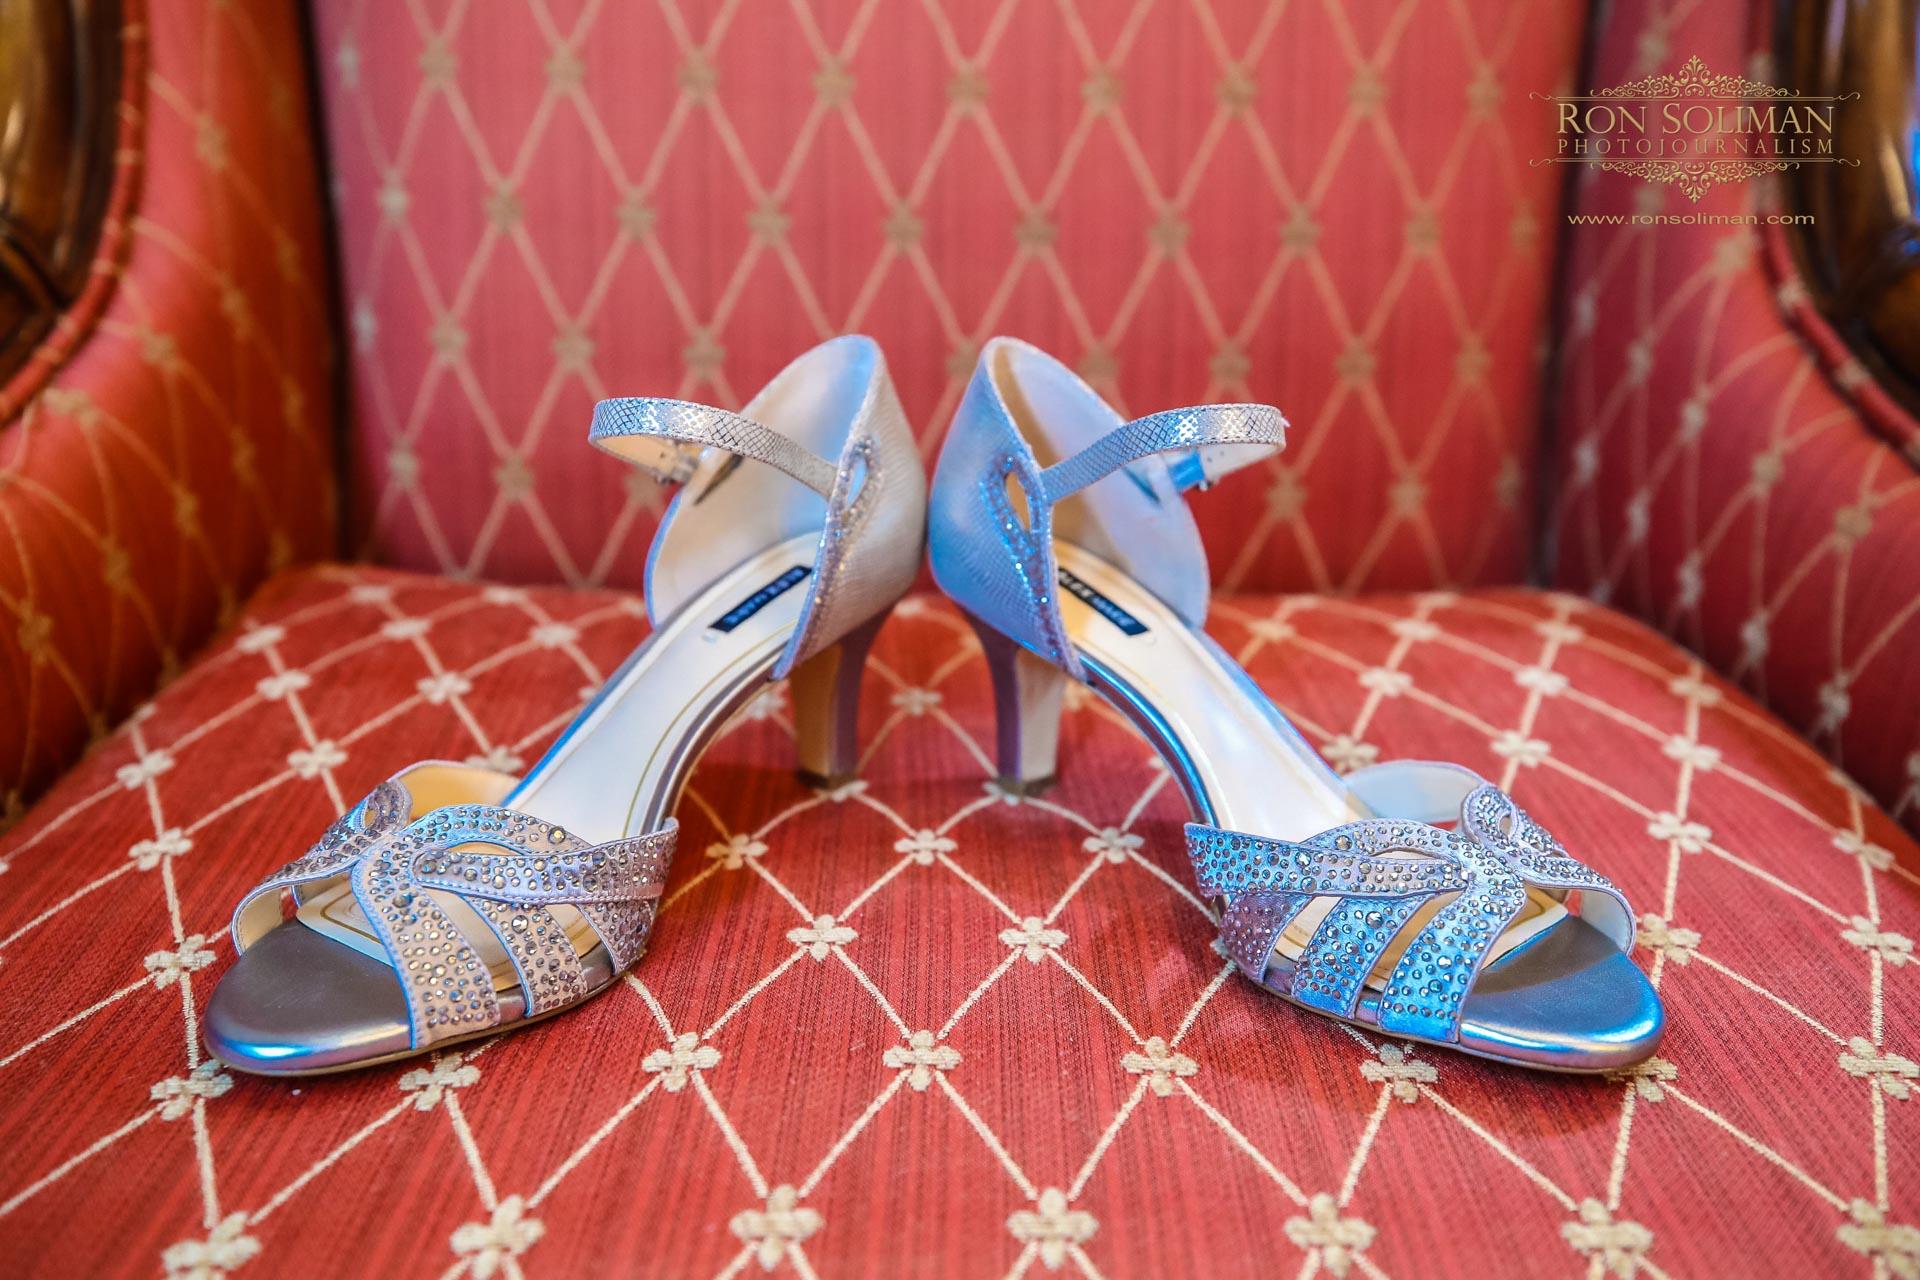 THE MERION WEDDING 7